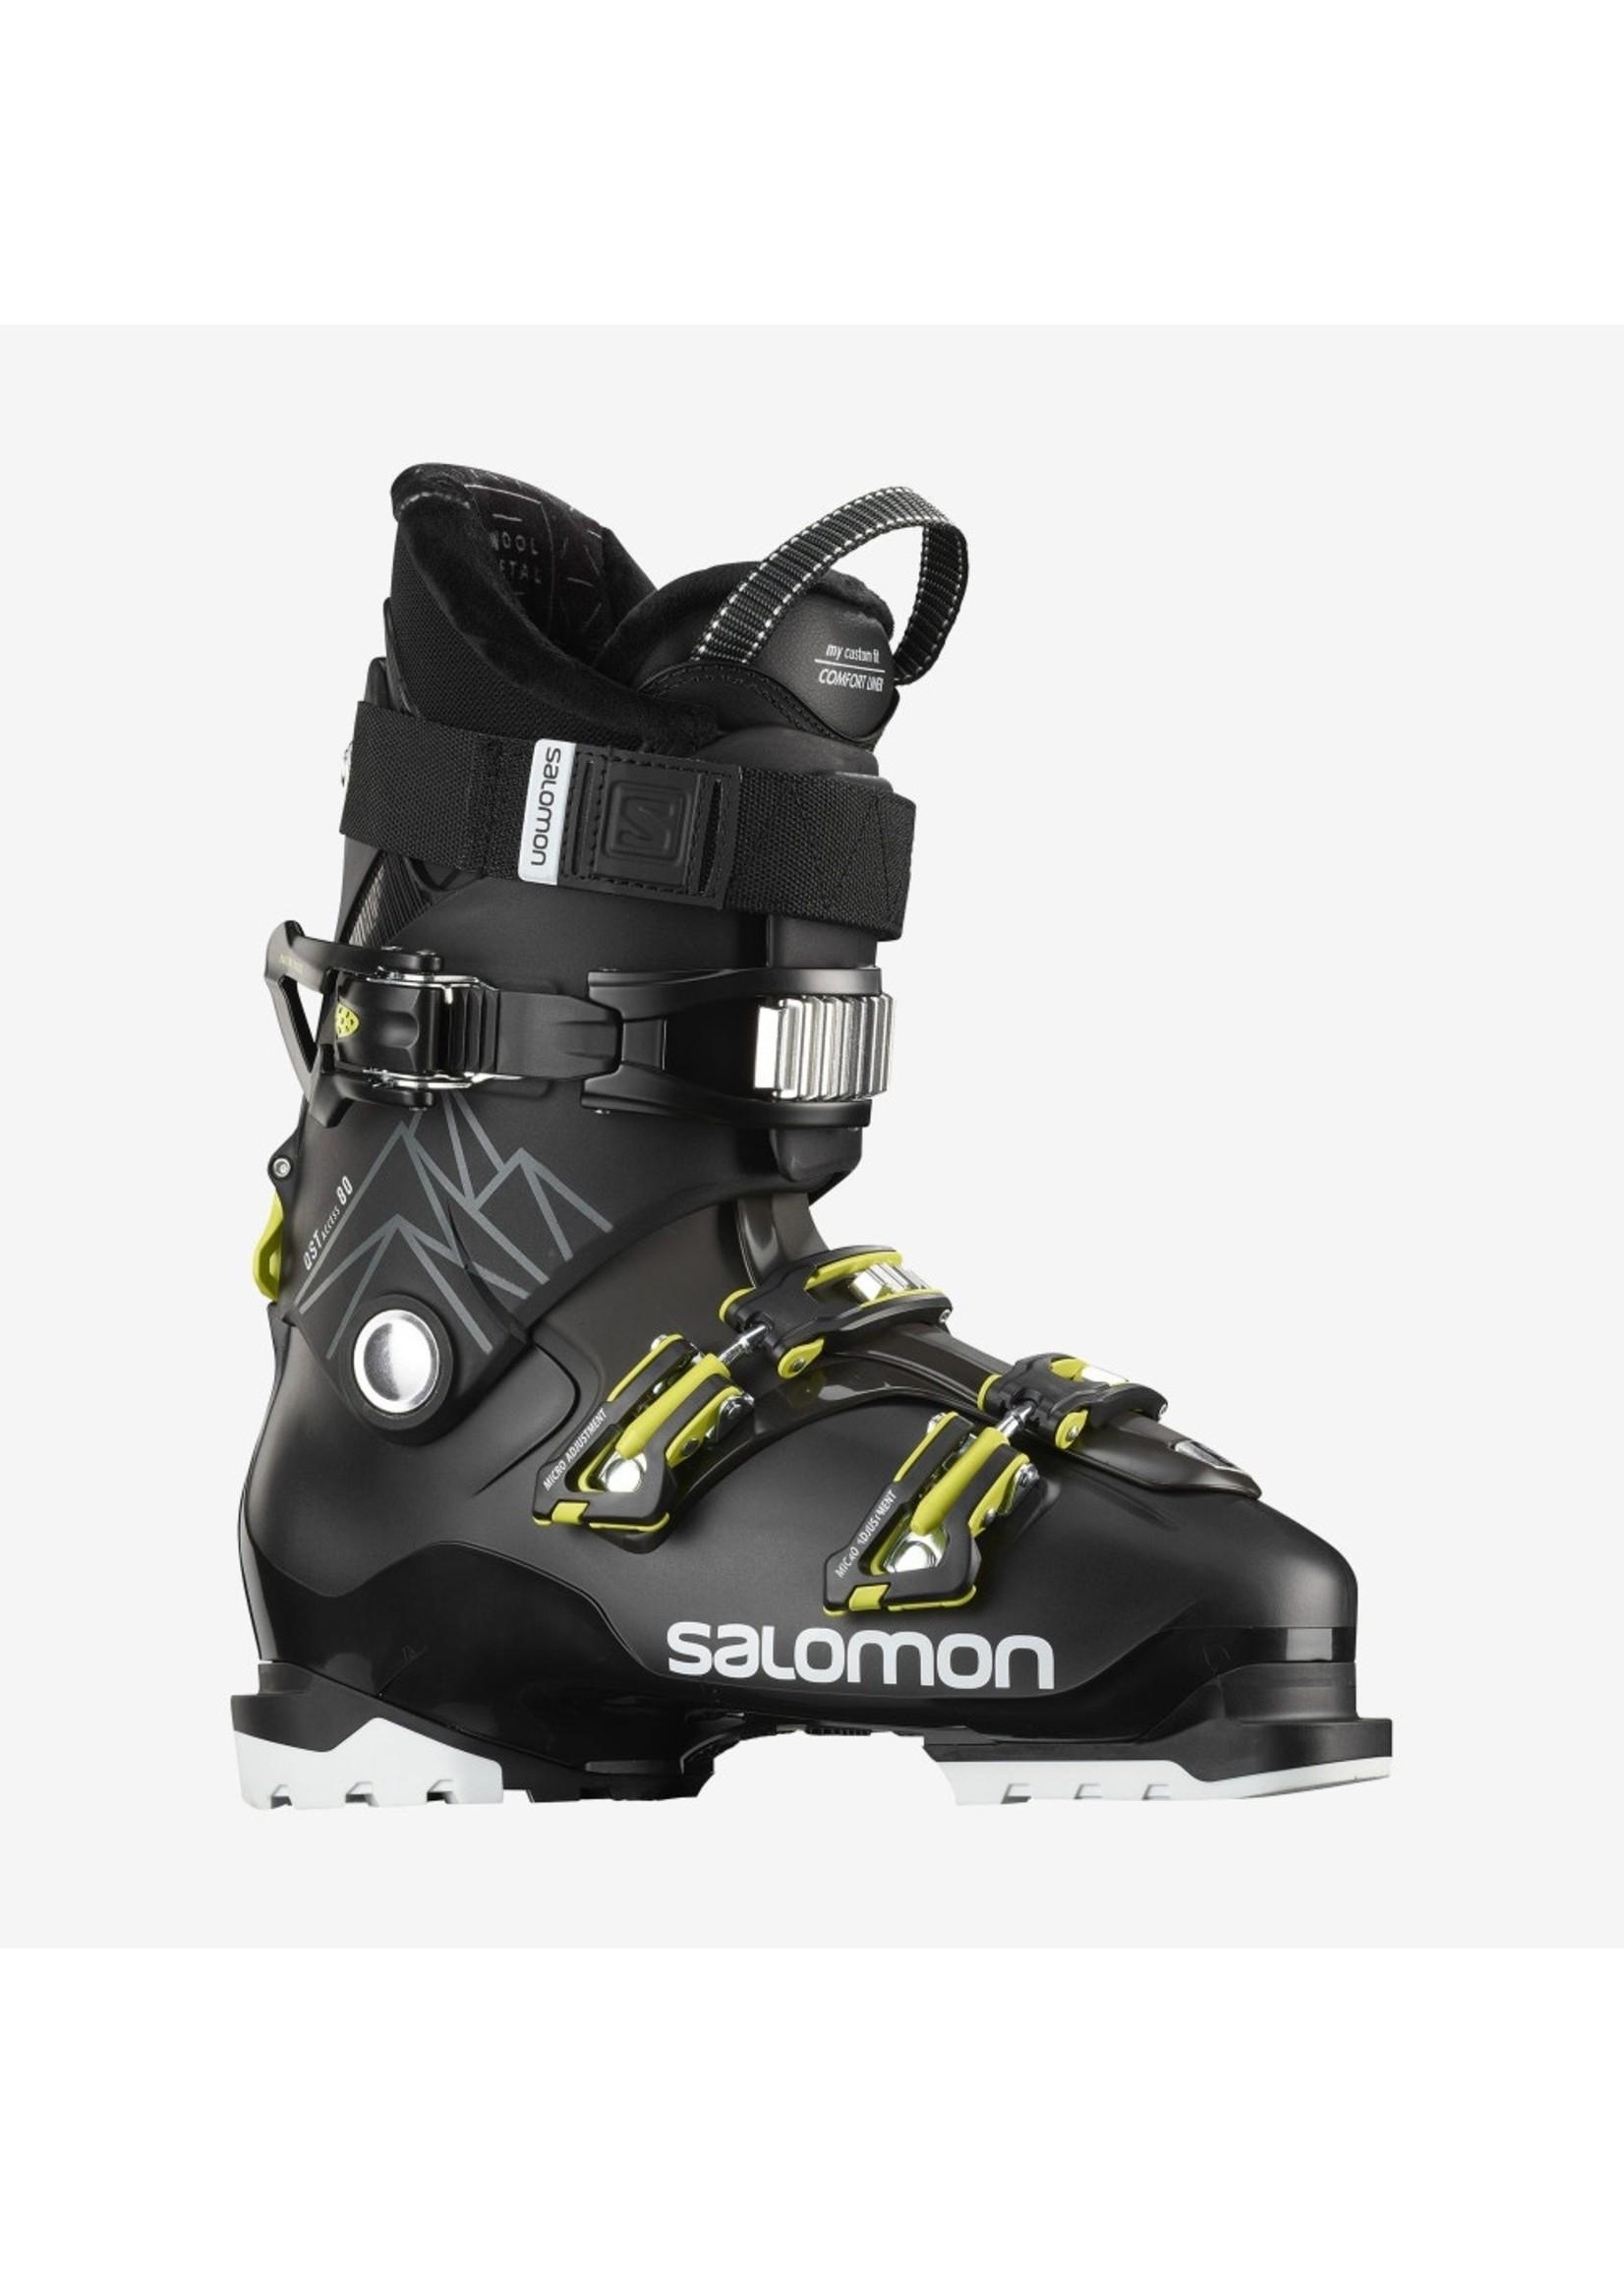 Salomon ALP. BOOTS QST Access 80 BLACK/Beluga/Ac